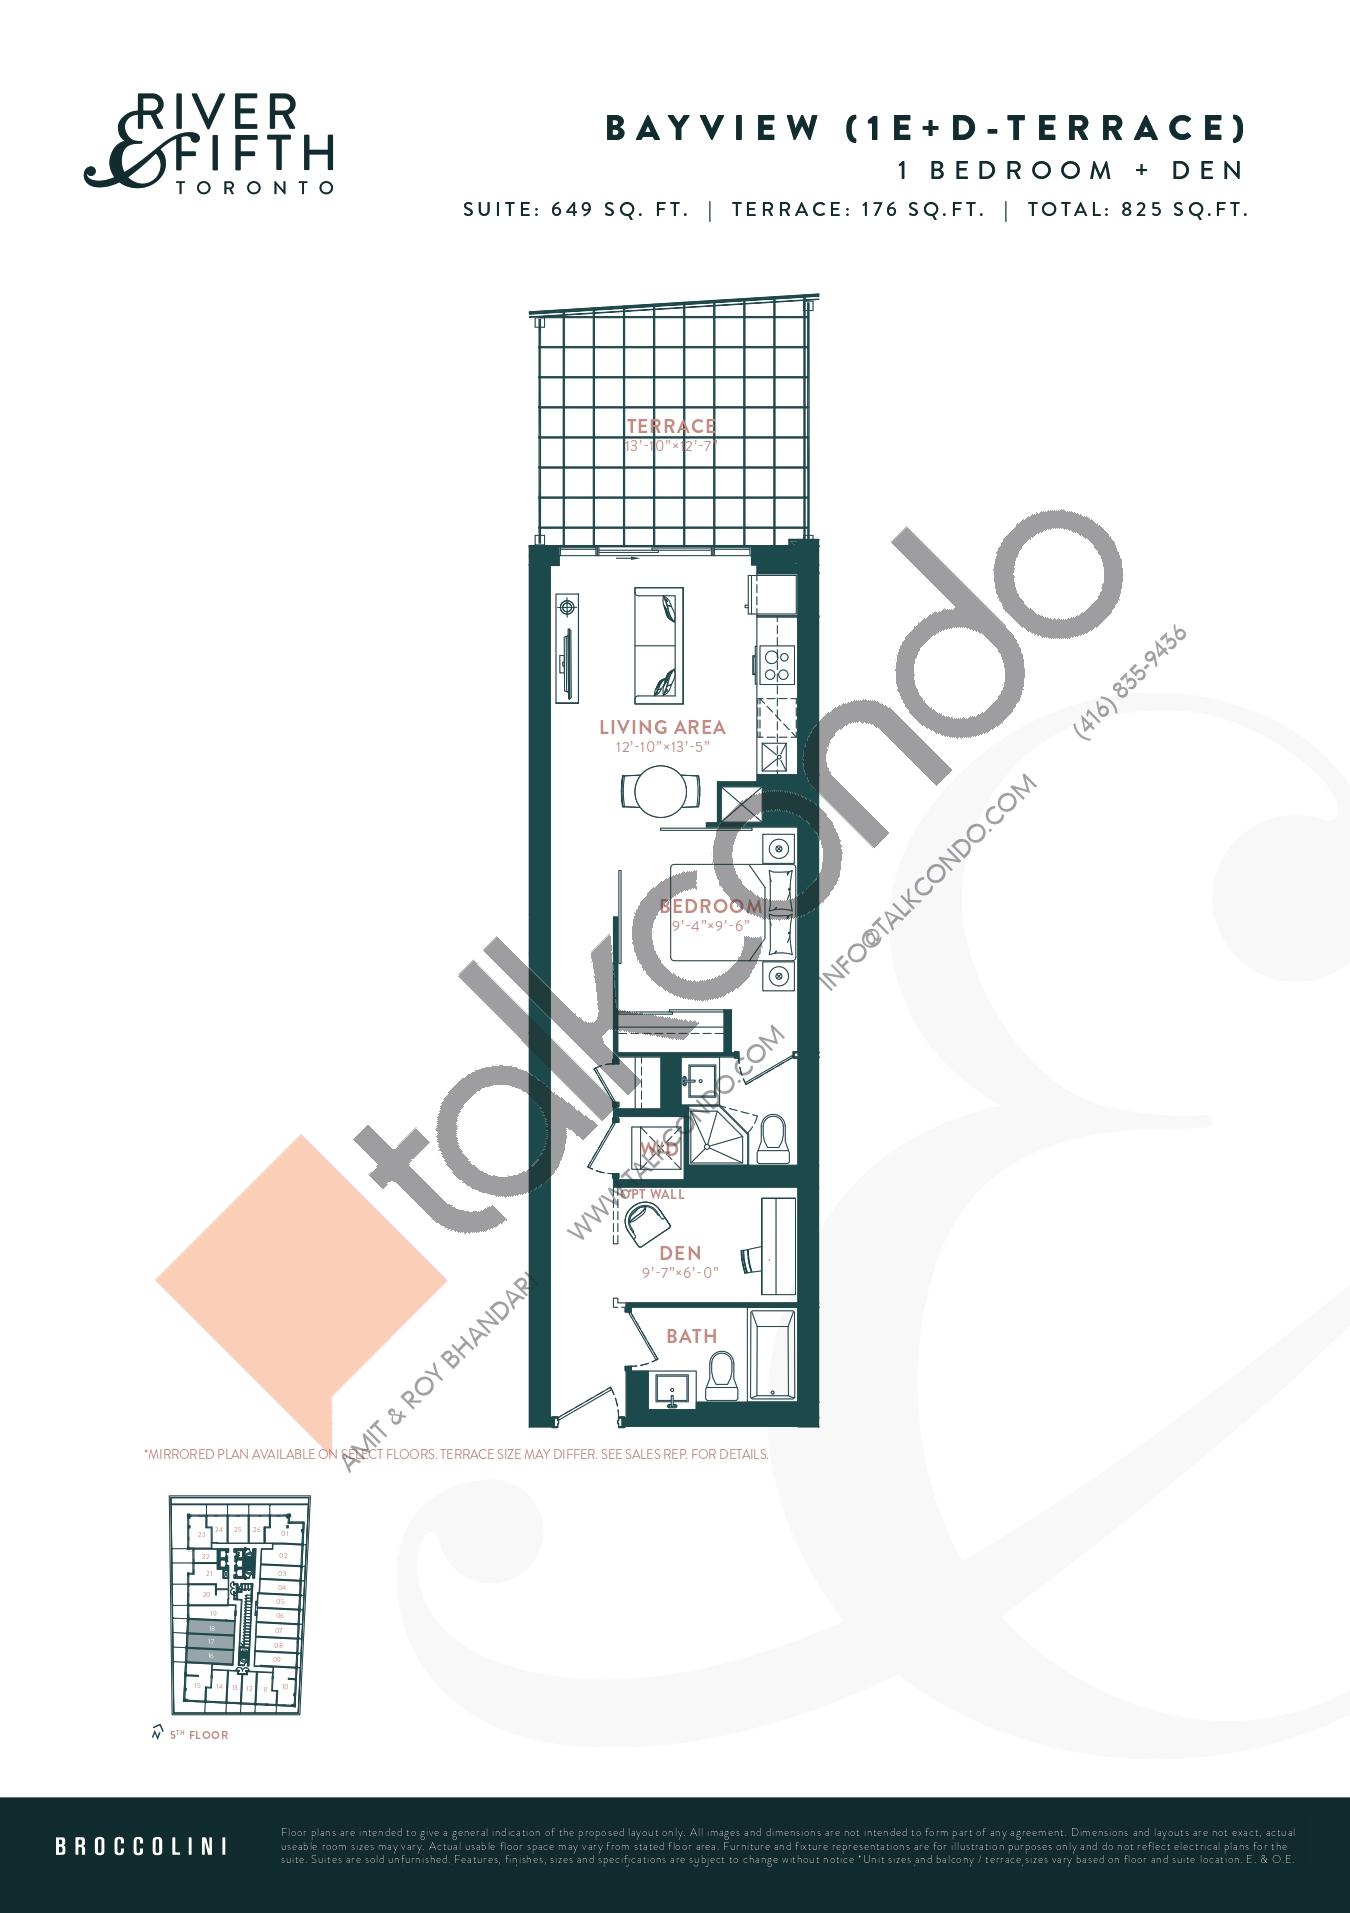 Bayview (1E+D-Terrace) Floor Plan at River & Fifth Condos - 649 sq.ft